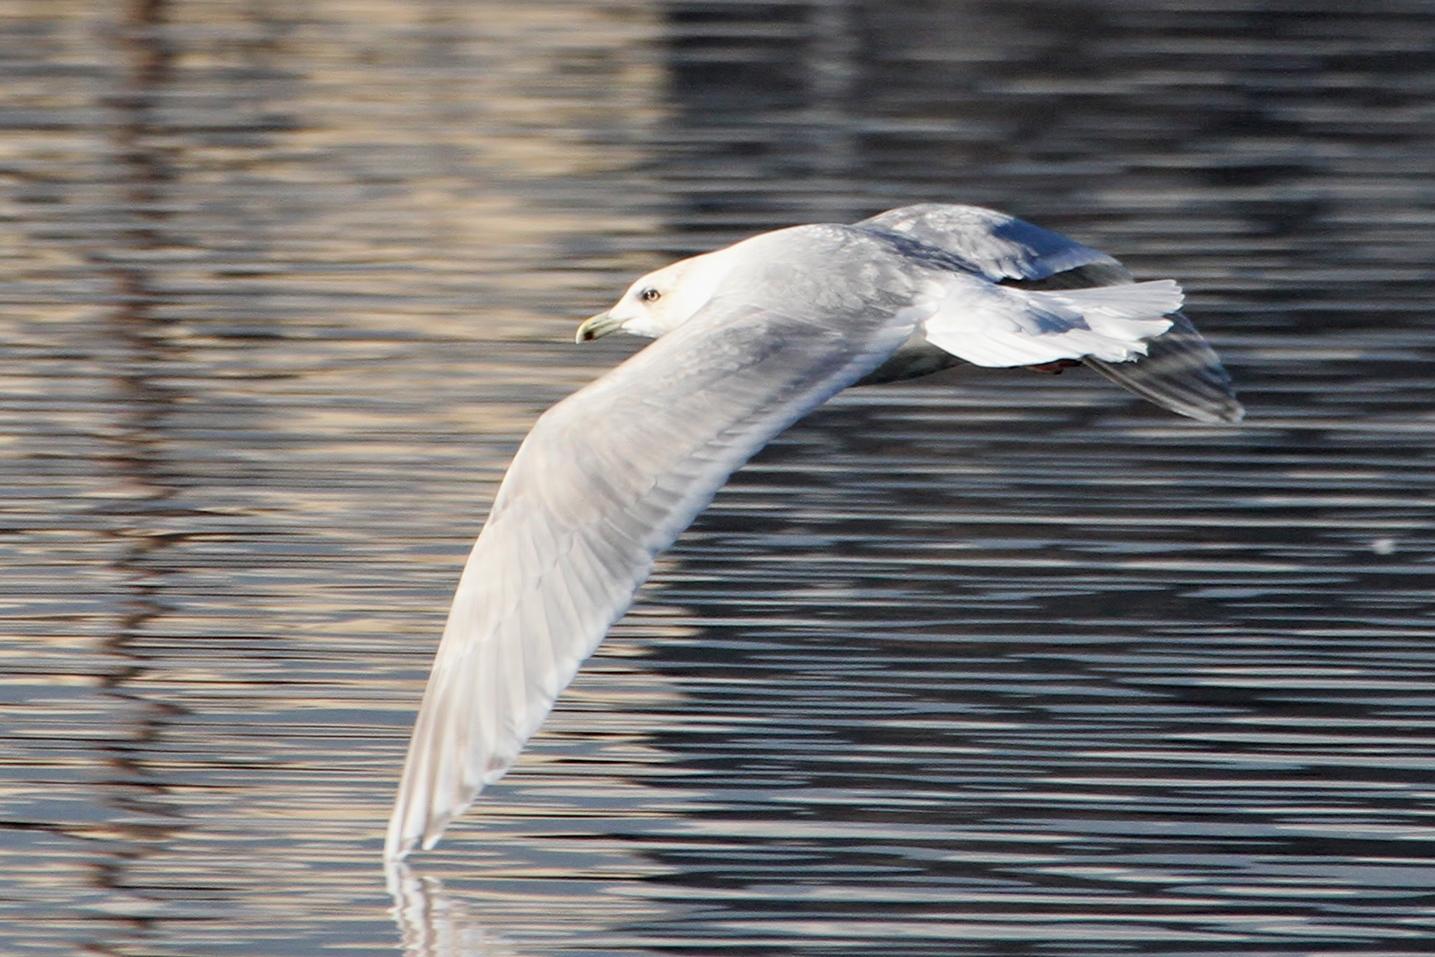 Iceland Gull / Photo: Martin Meyers